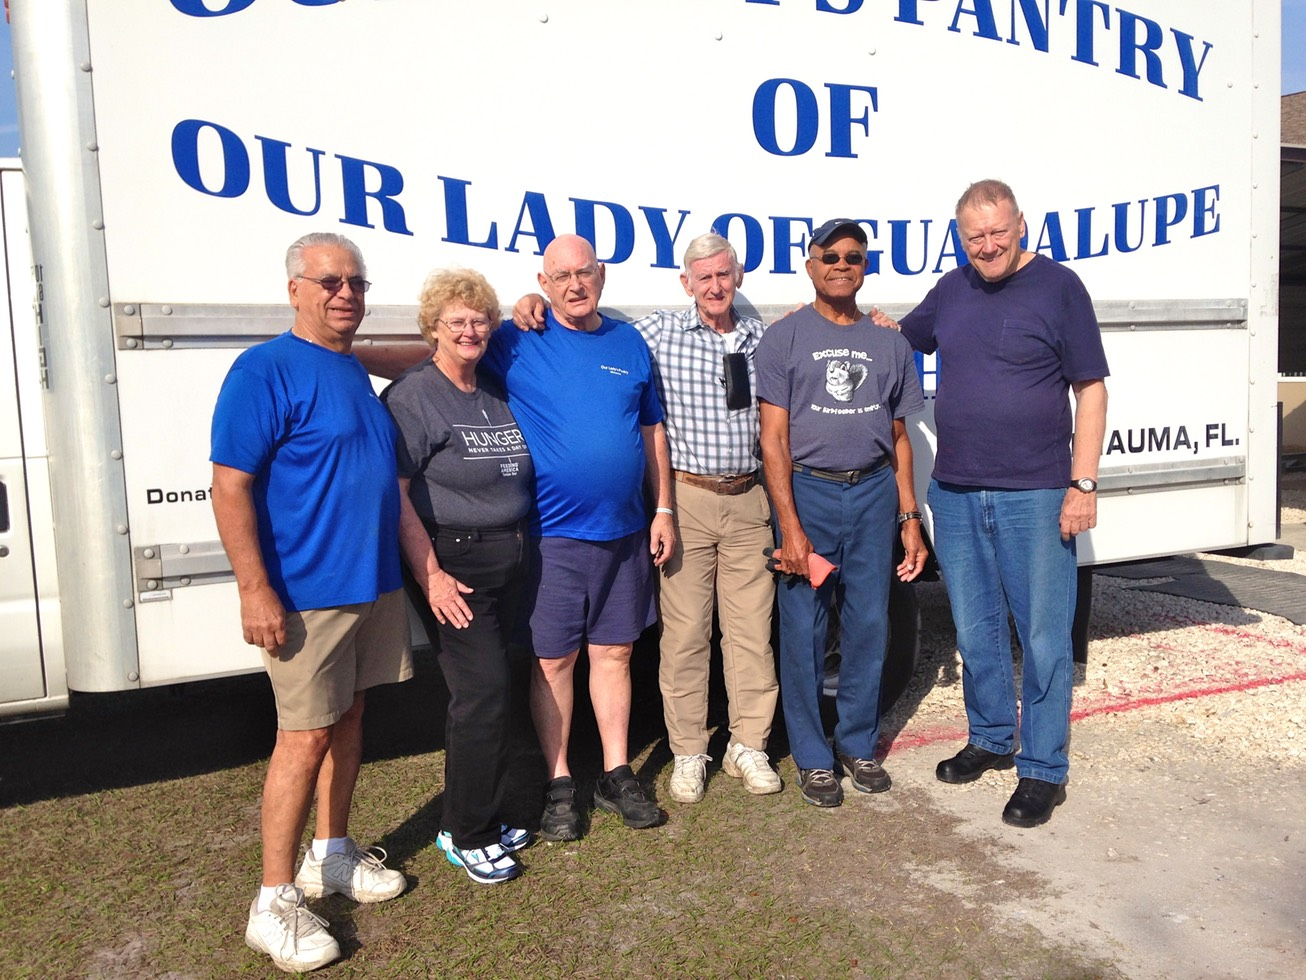 Six volunteers standing in front of pantry truck